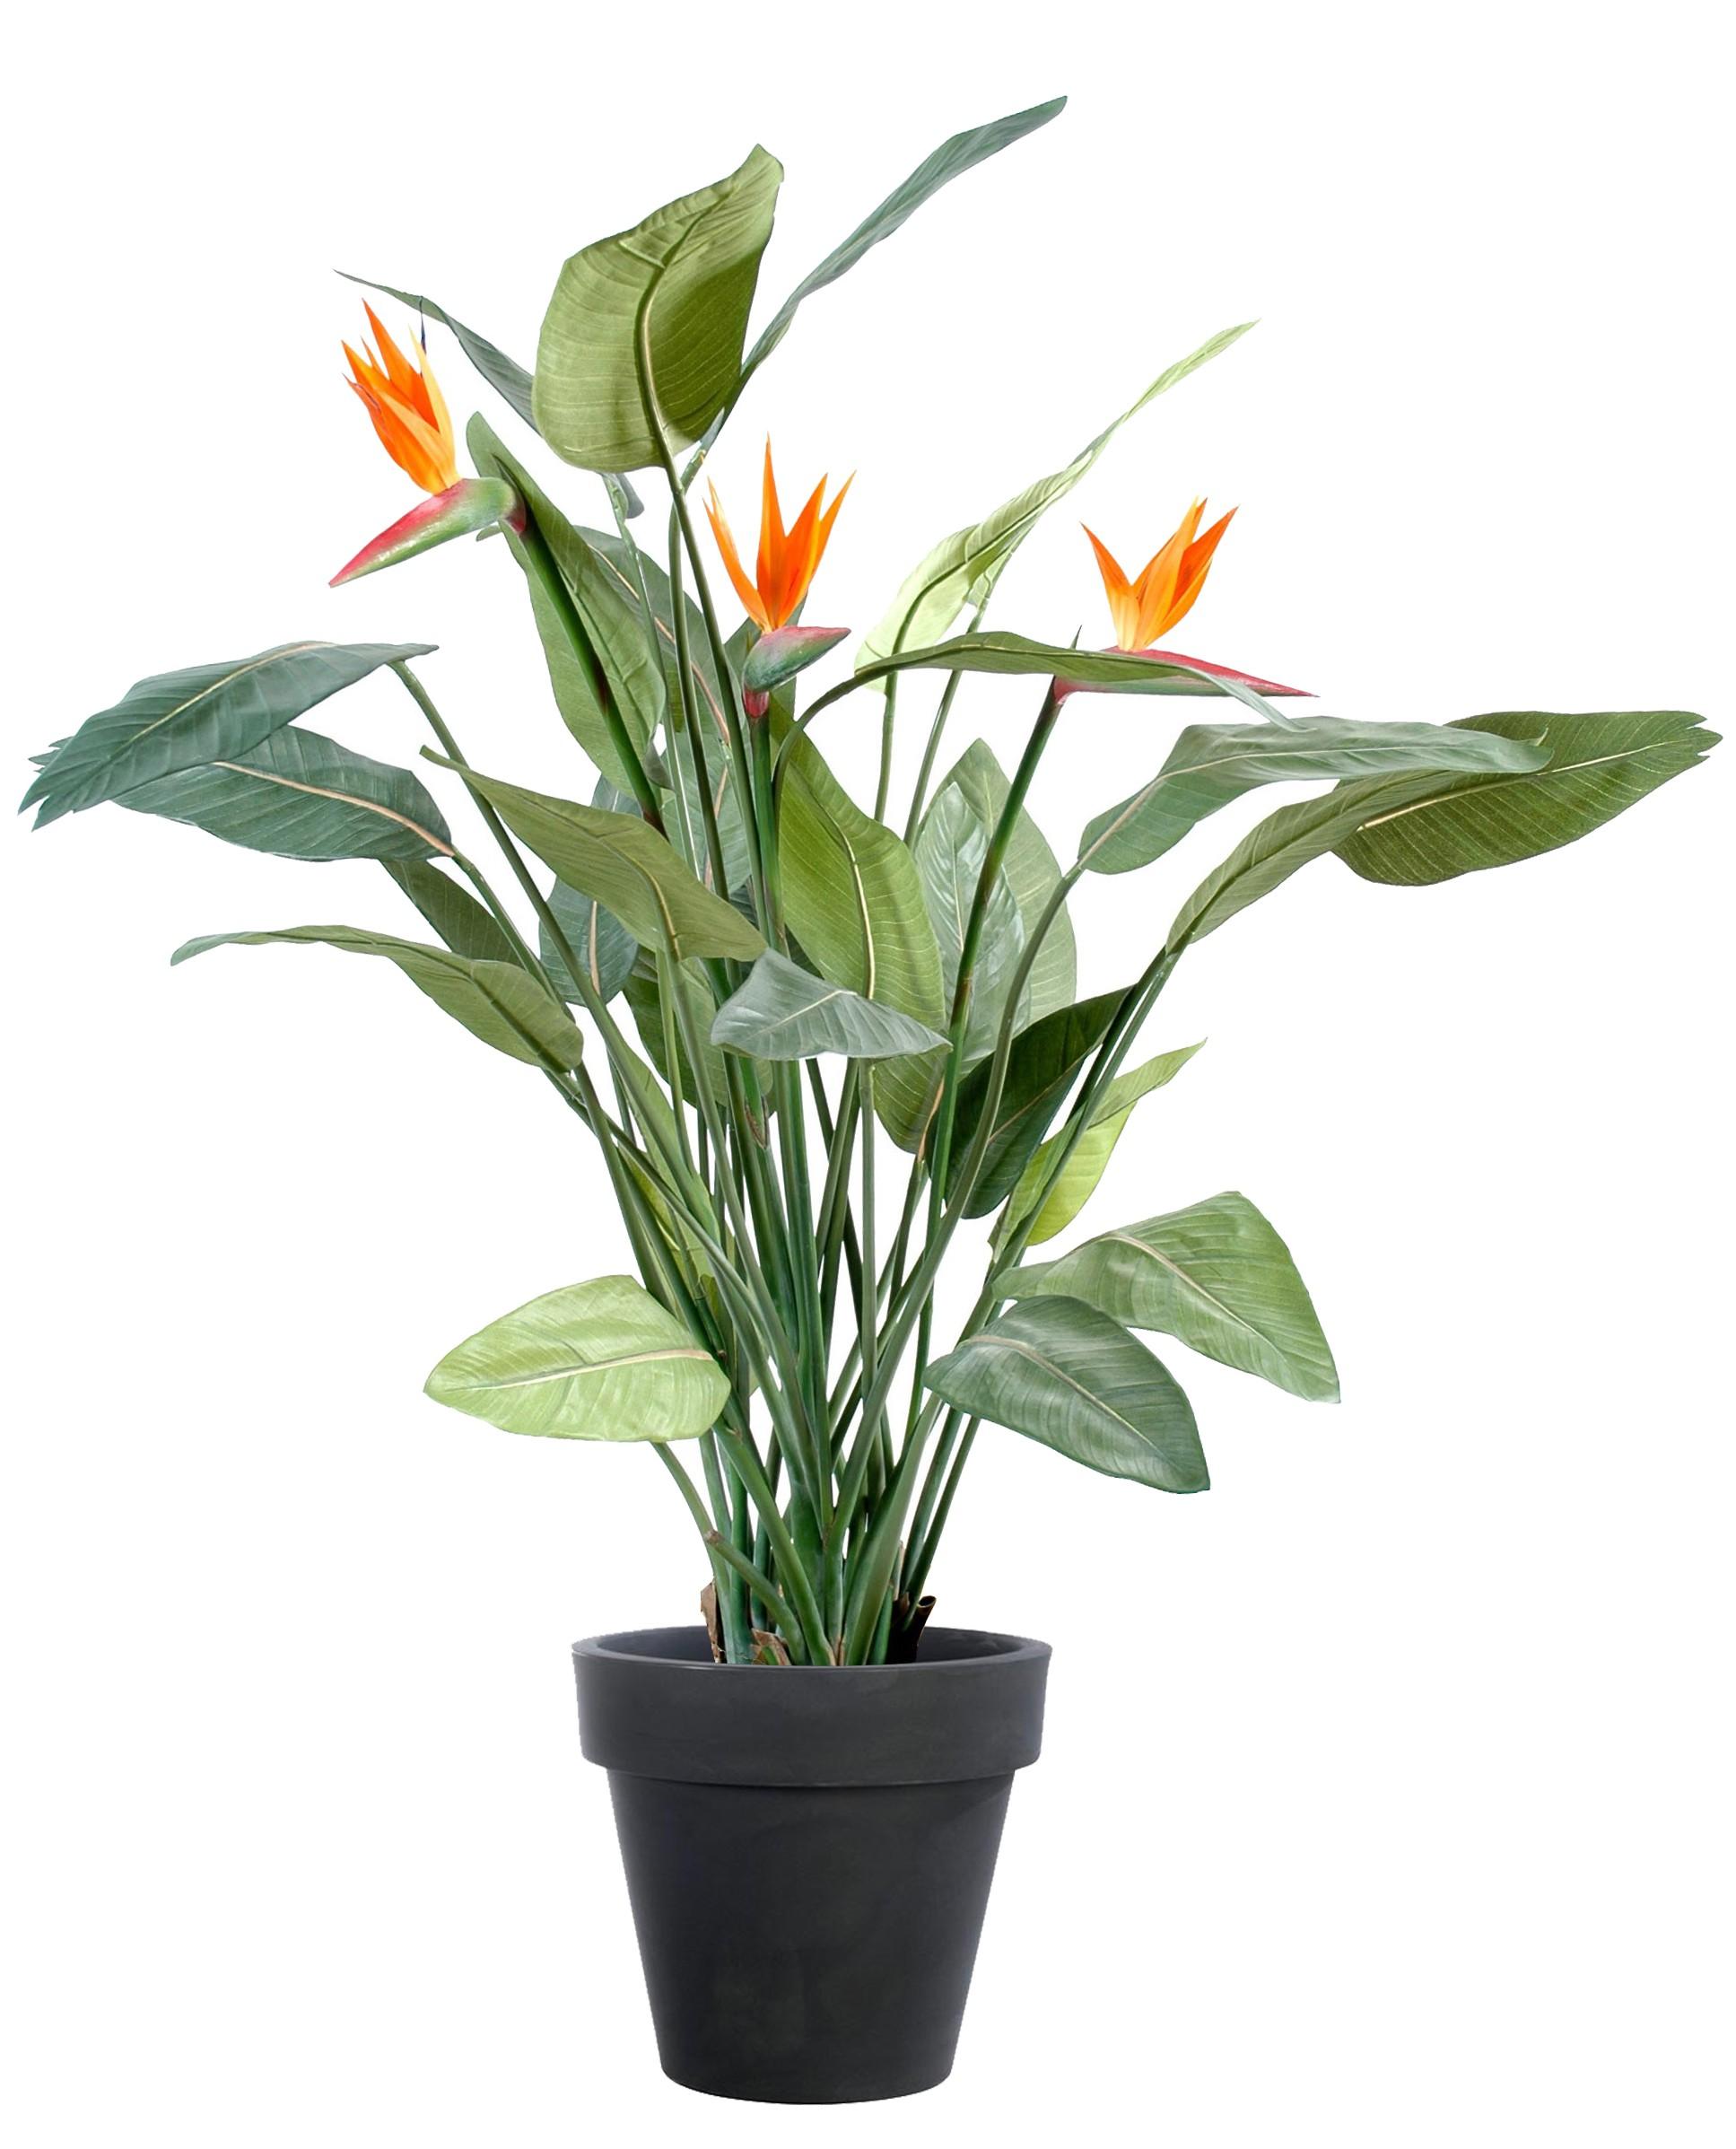 plante exotique strelitzia